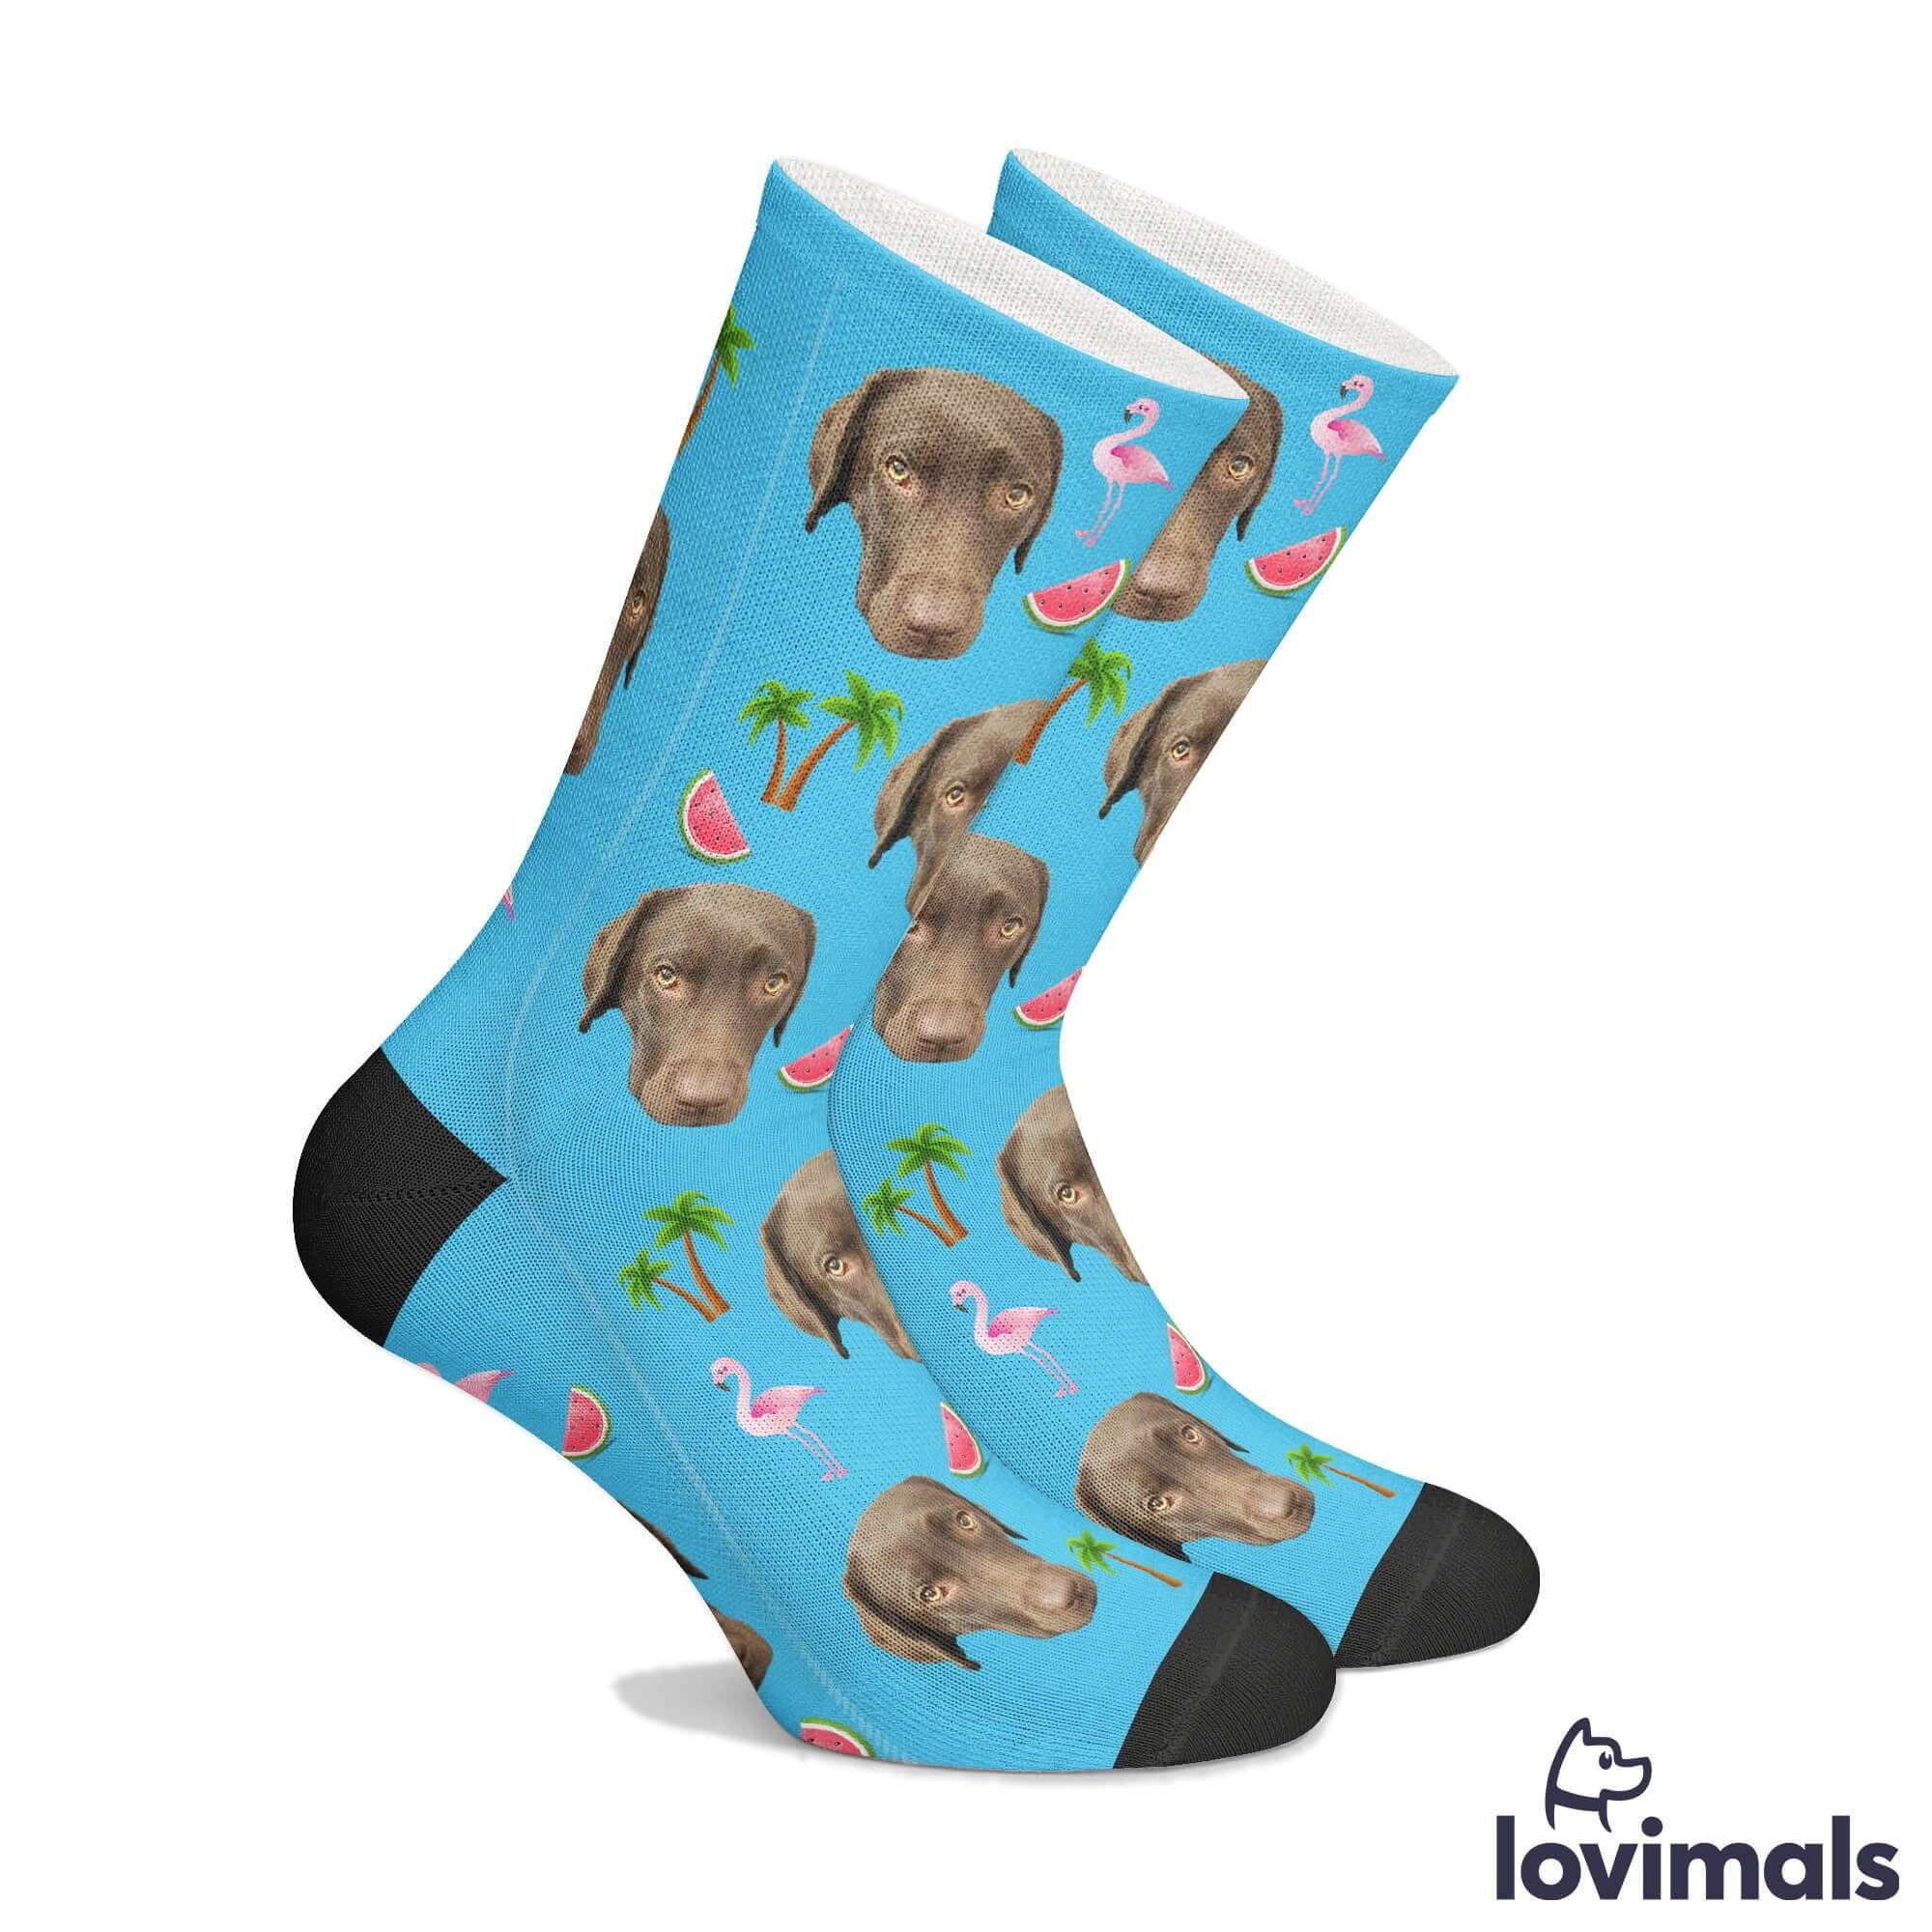 Customizable Dog Socks (With images) Dog socks